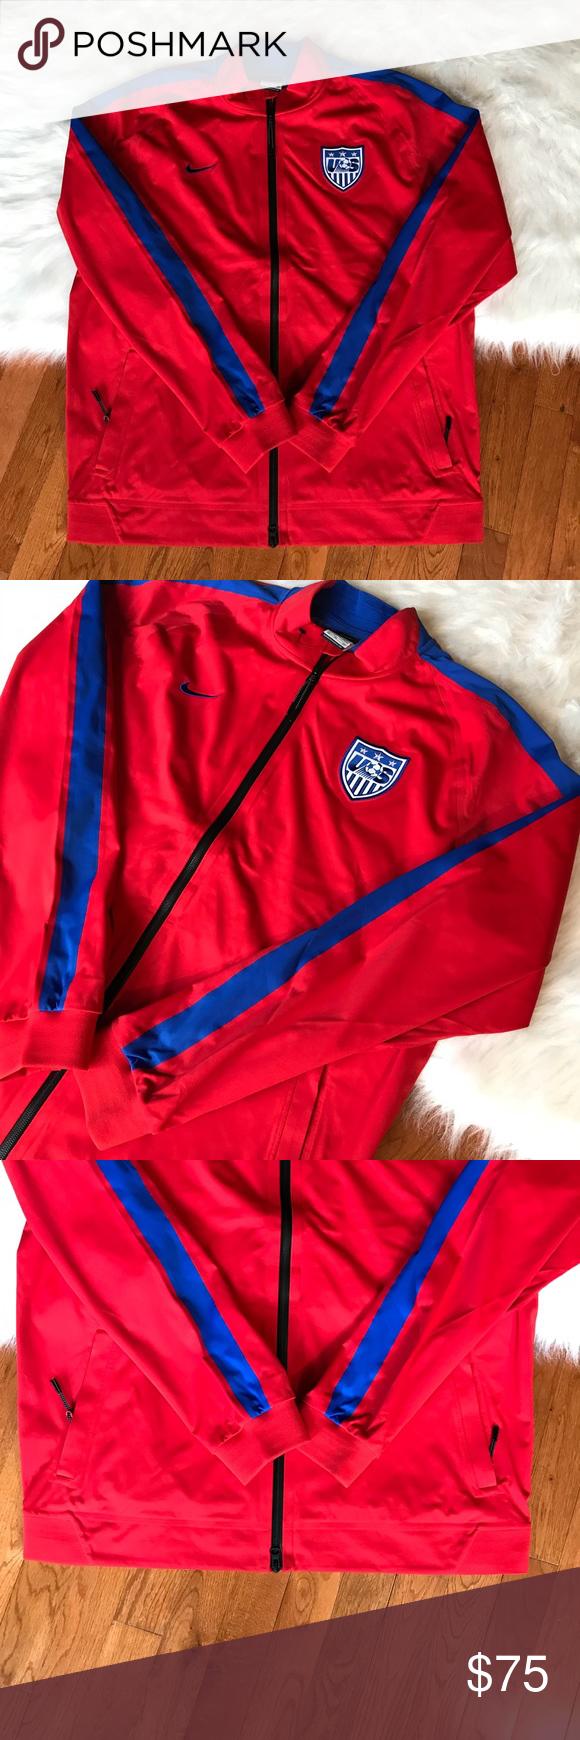 36b9e85ed Nike USA Men's Soccer National Team Track Jacket Brand new sz XL Nike  Jackets & Coats